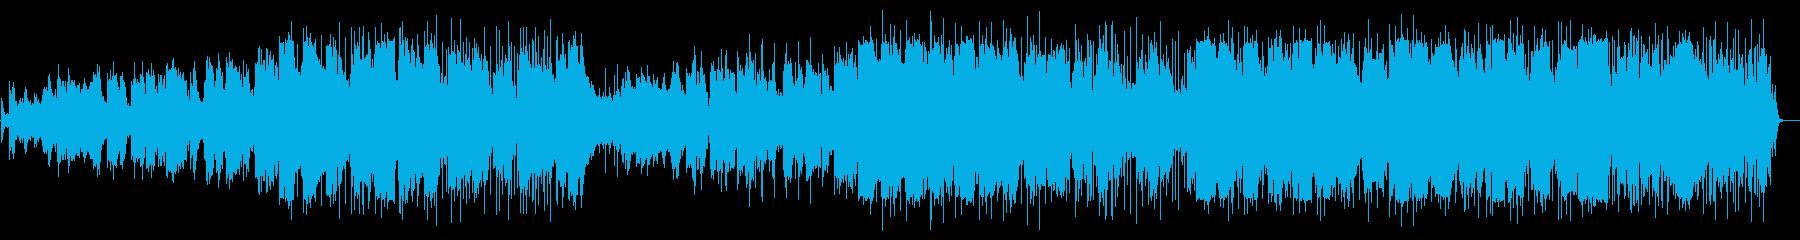 80Sシティポップラブバラードの再生済みの波形